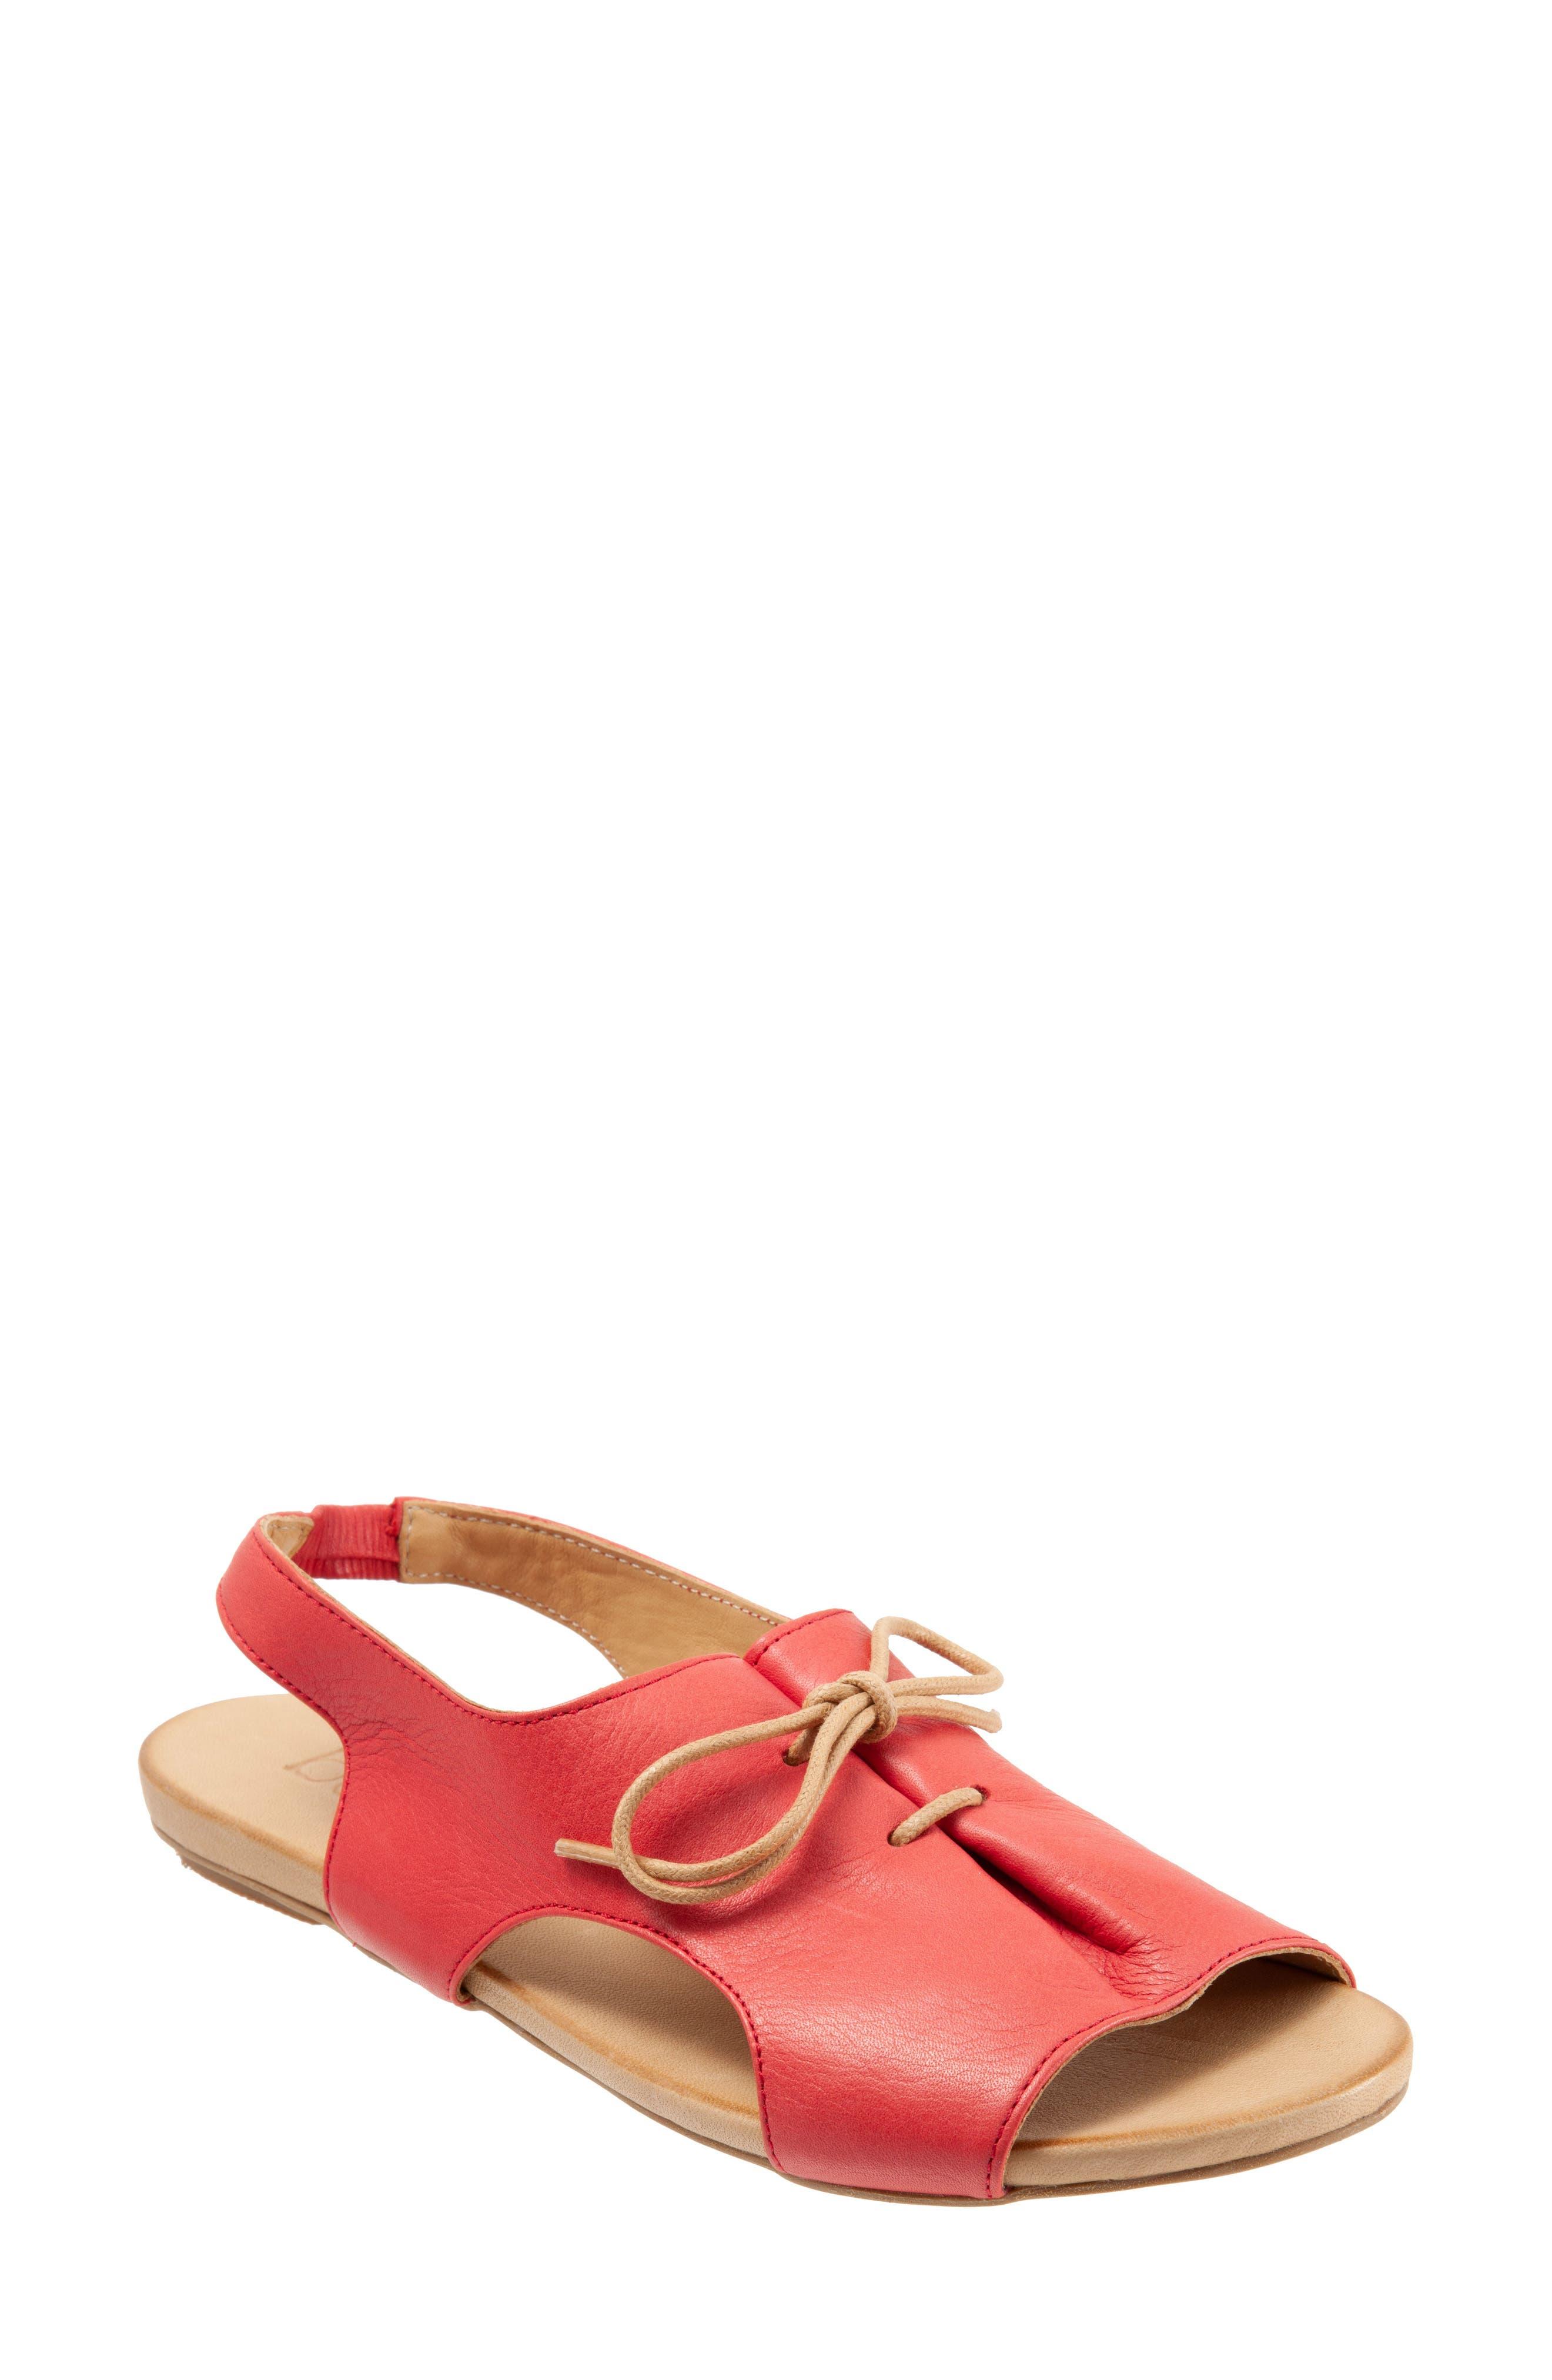 Kenya Sandal